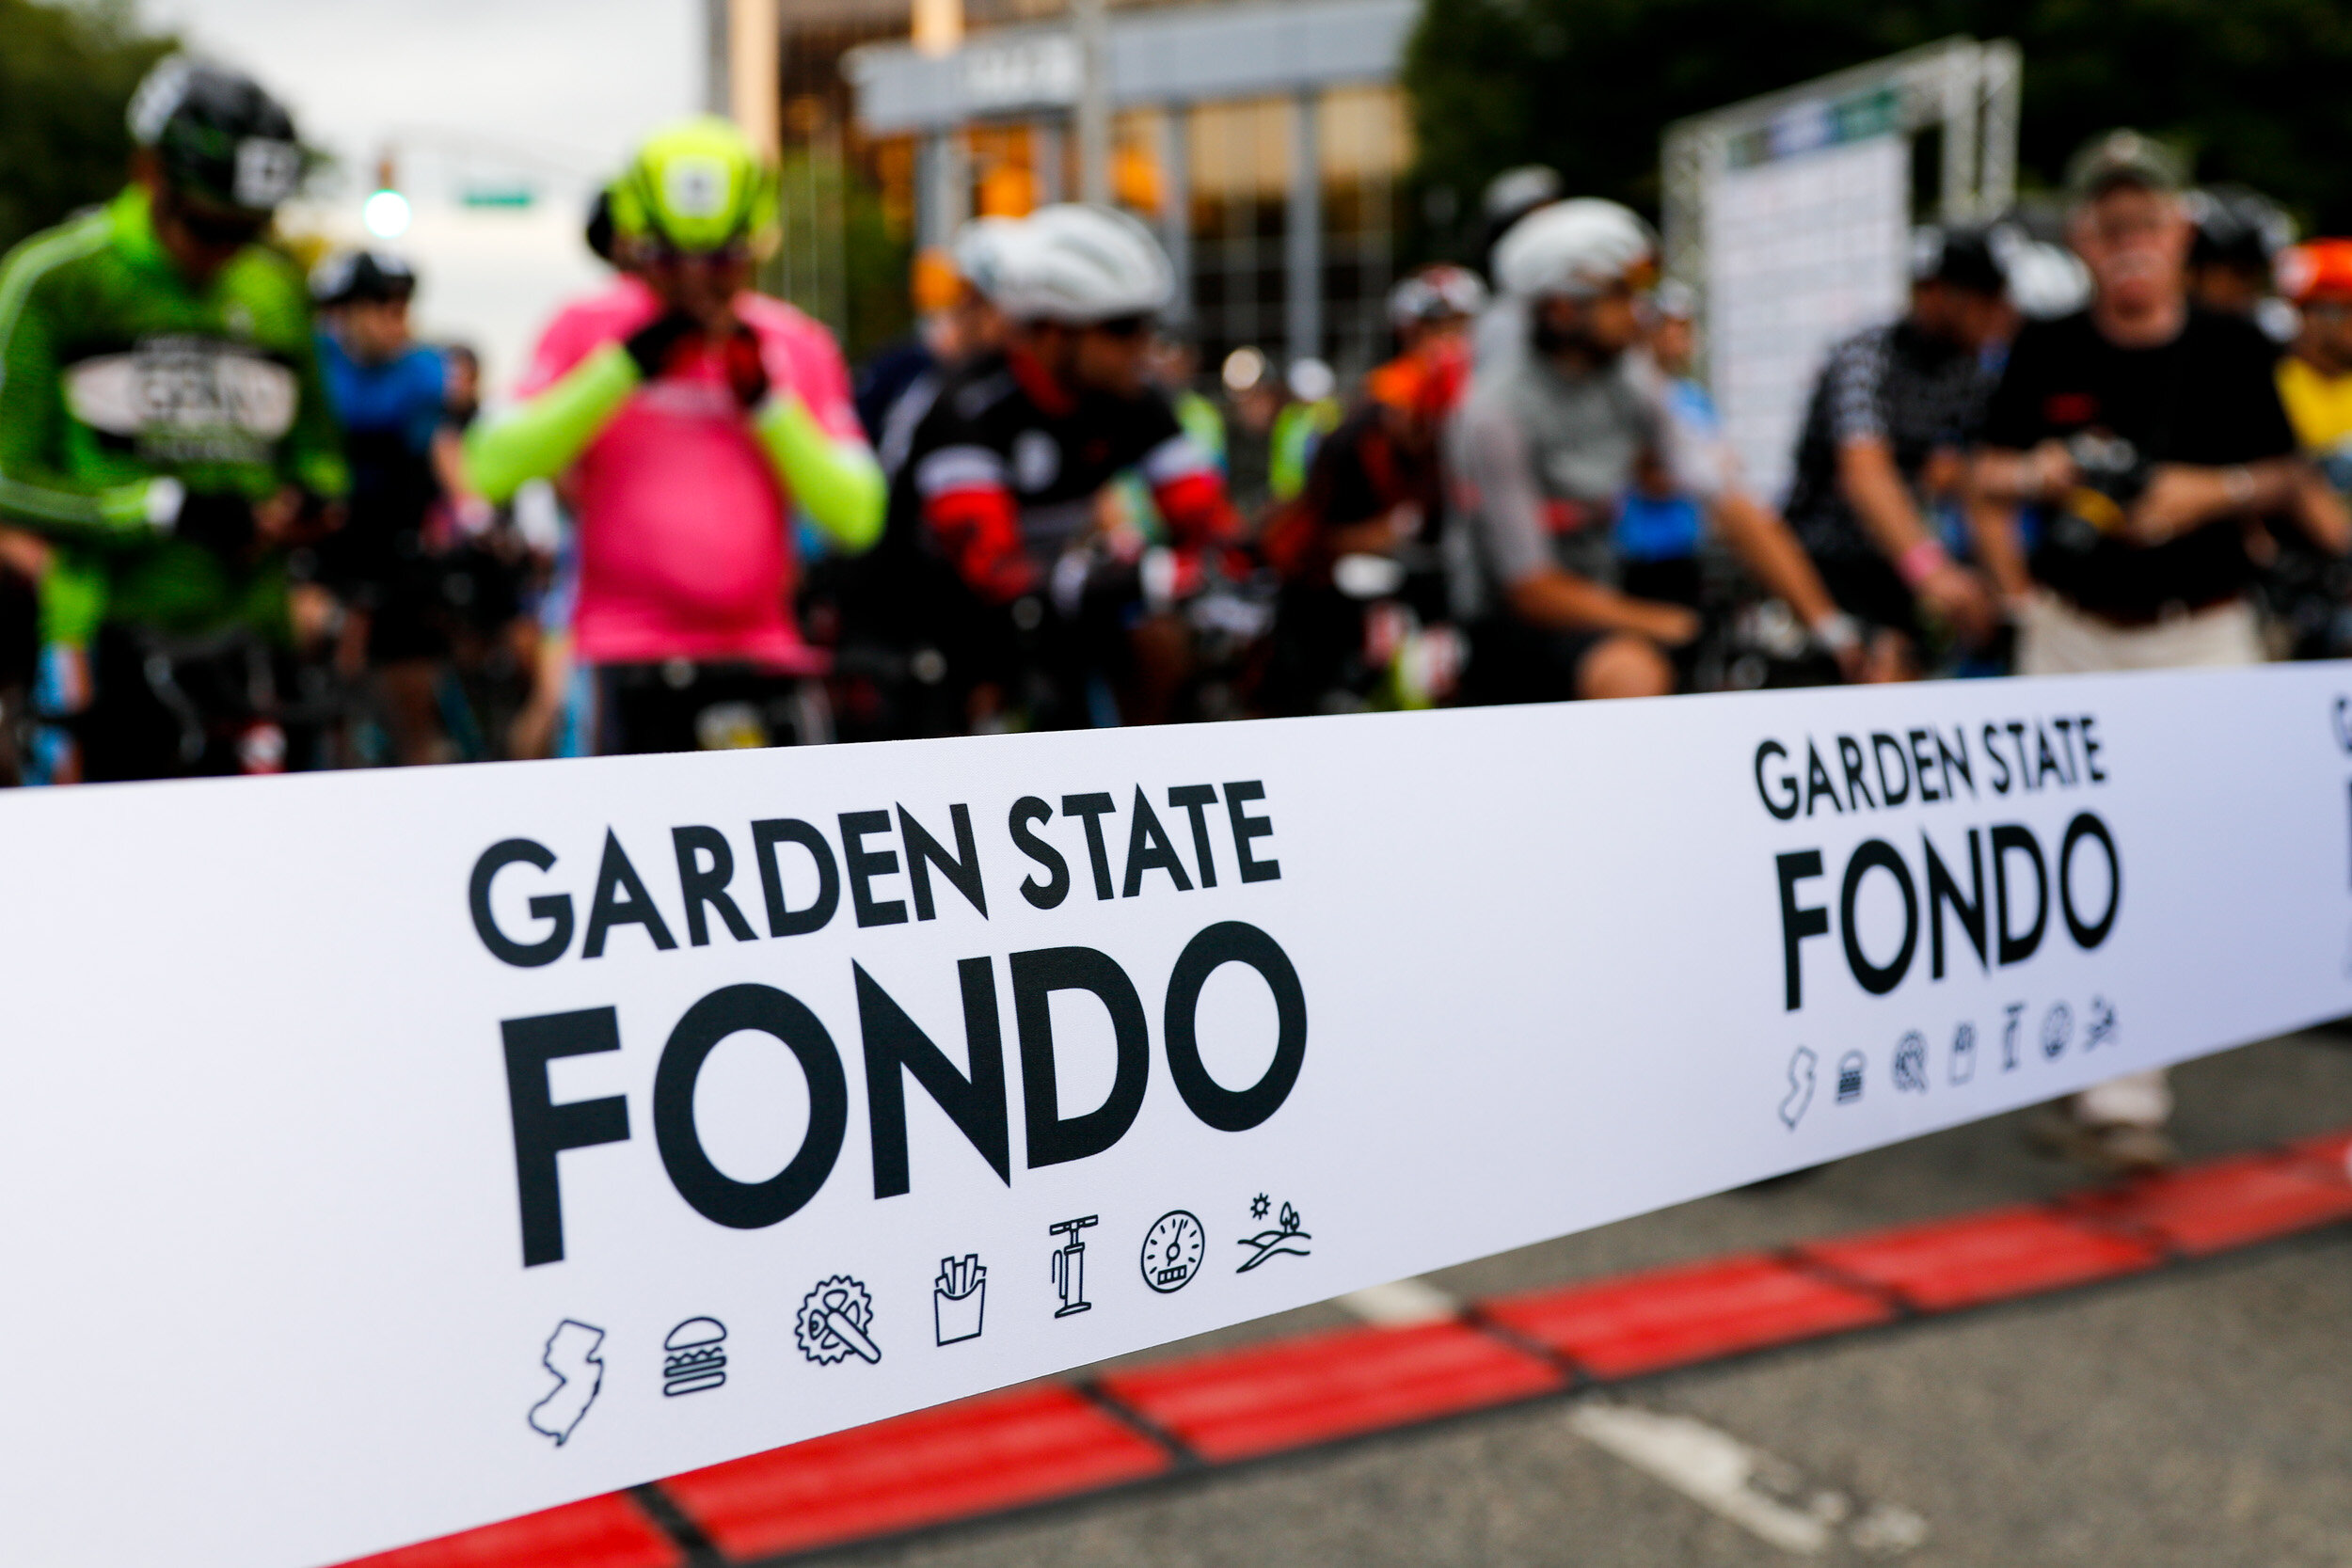 2019-GSF-Fondo00016.JPG